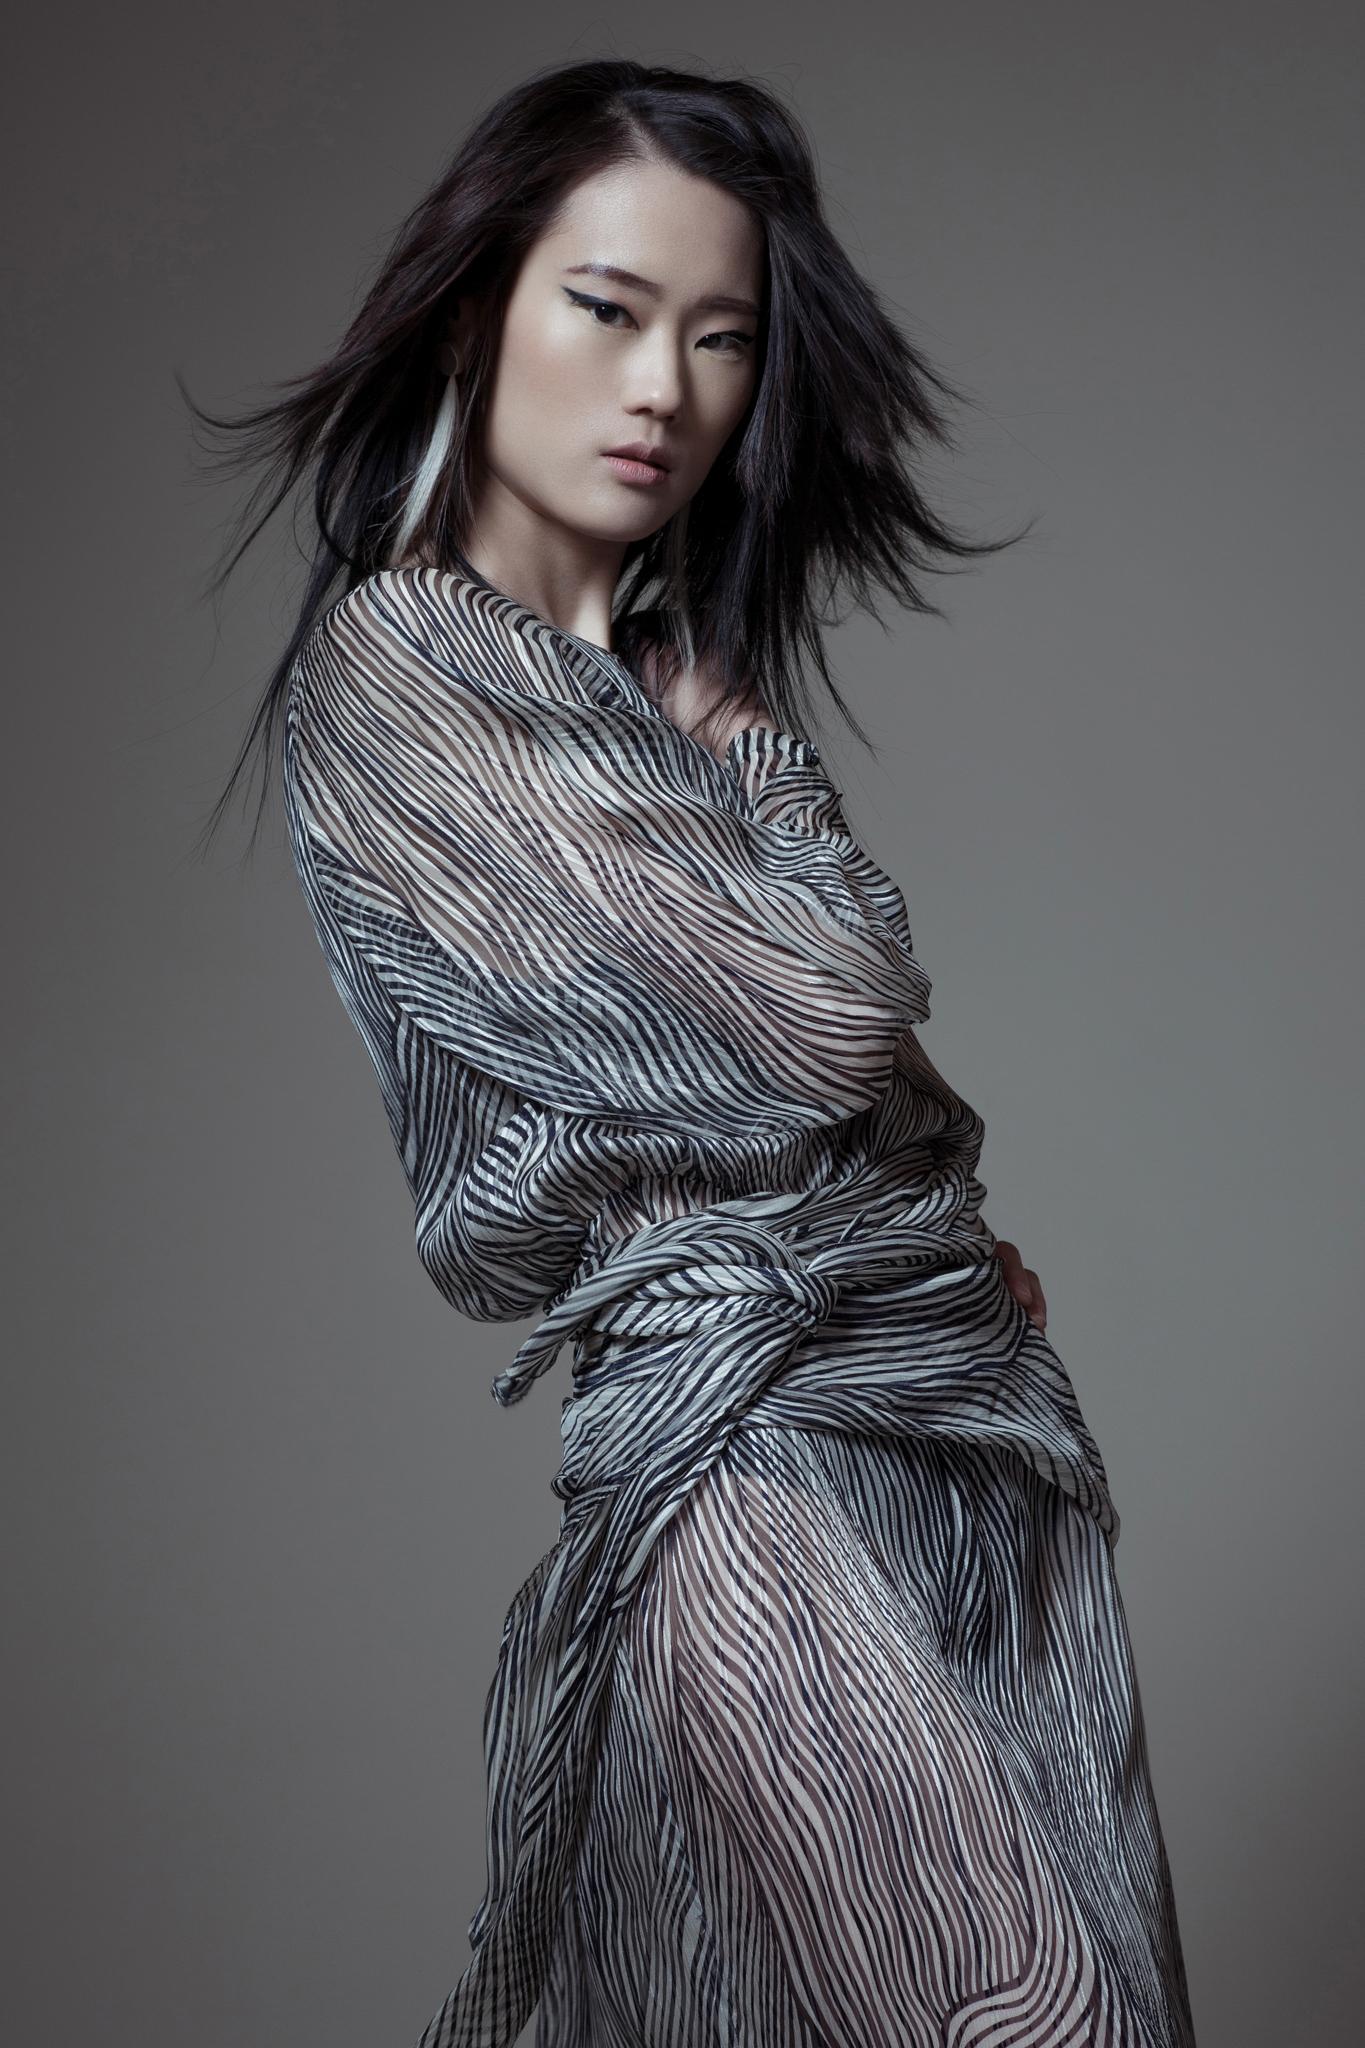 fashion-styling-by-geraldine-duskin-5.jpg